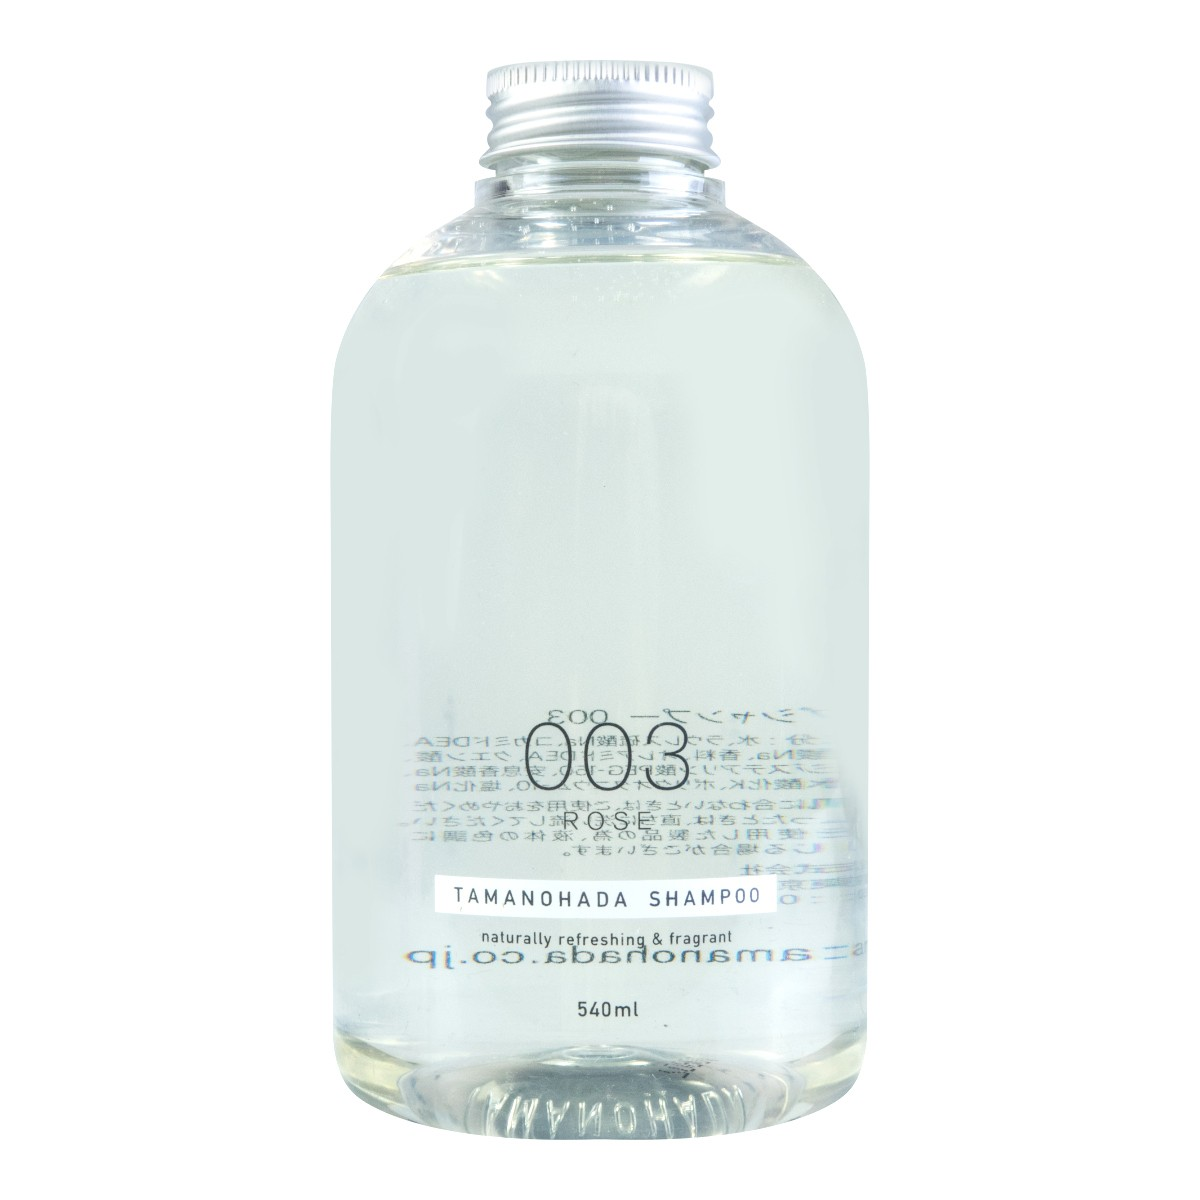 日本TAMANOHADA玉肌 无硅油洗发水 #003玫瑰香 540ml